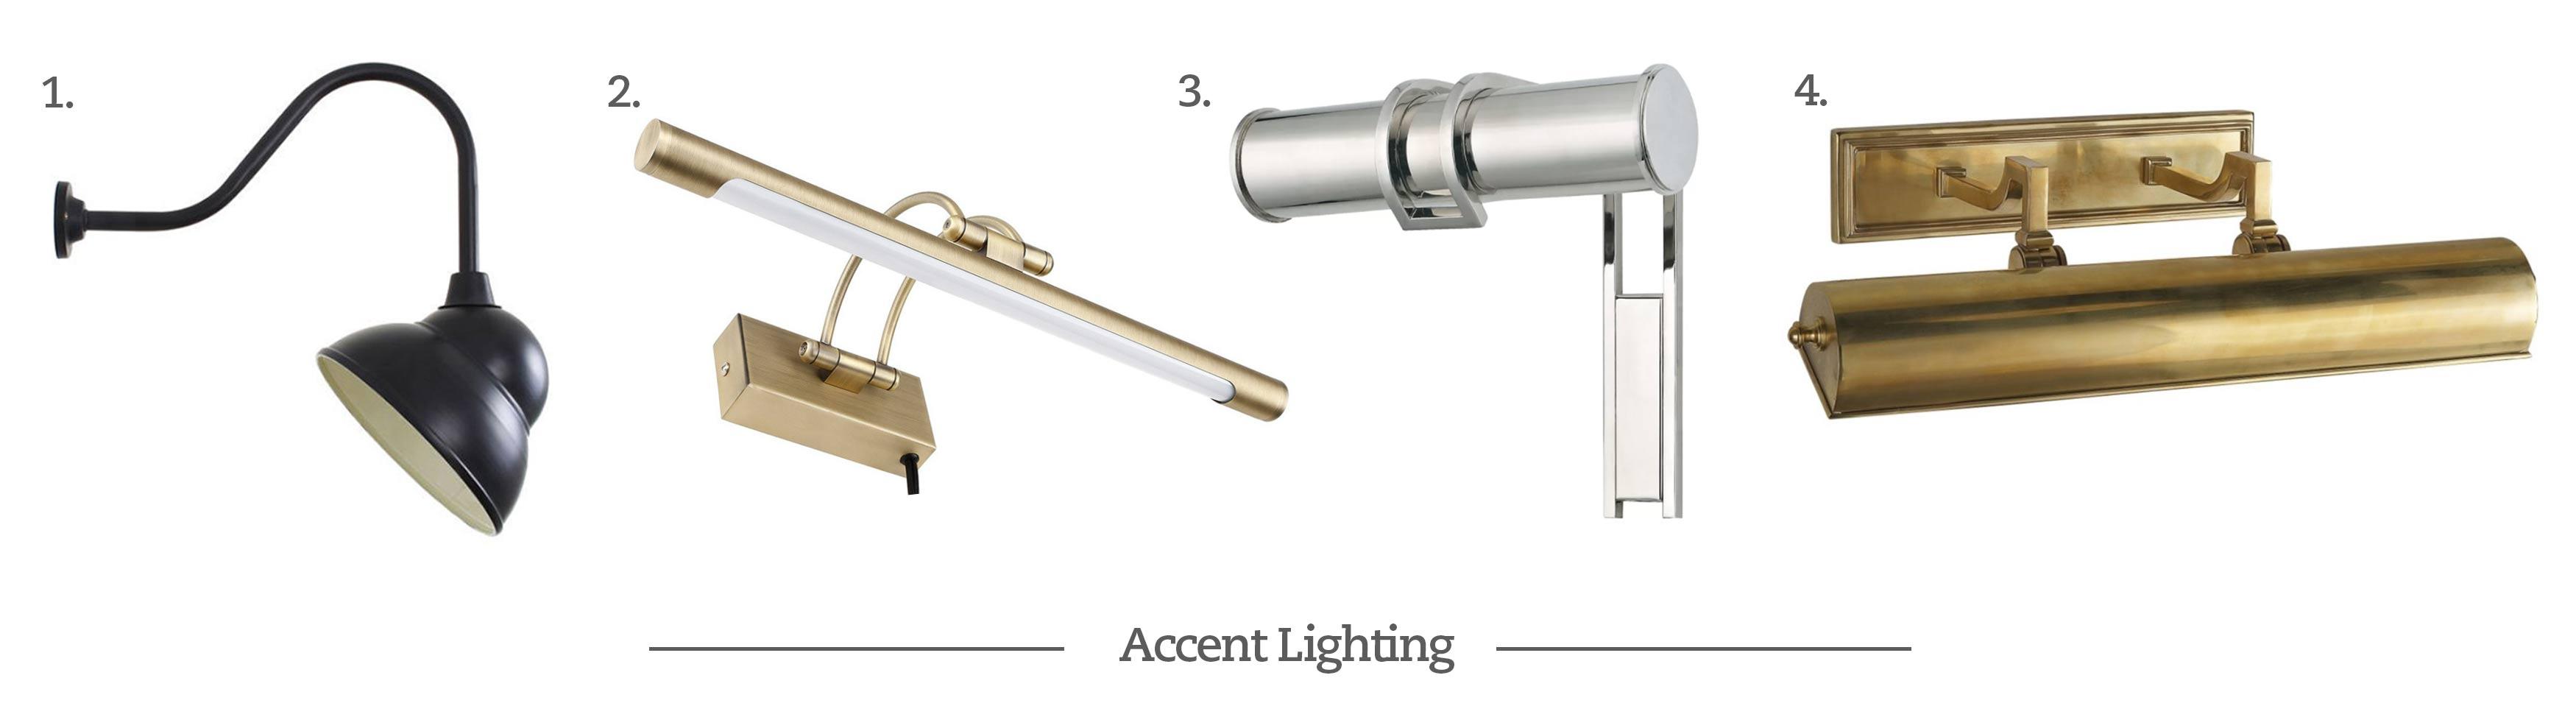 Accent Lighting Options